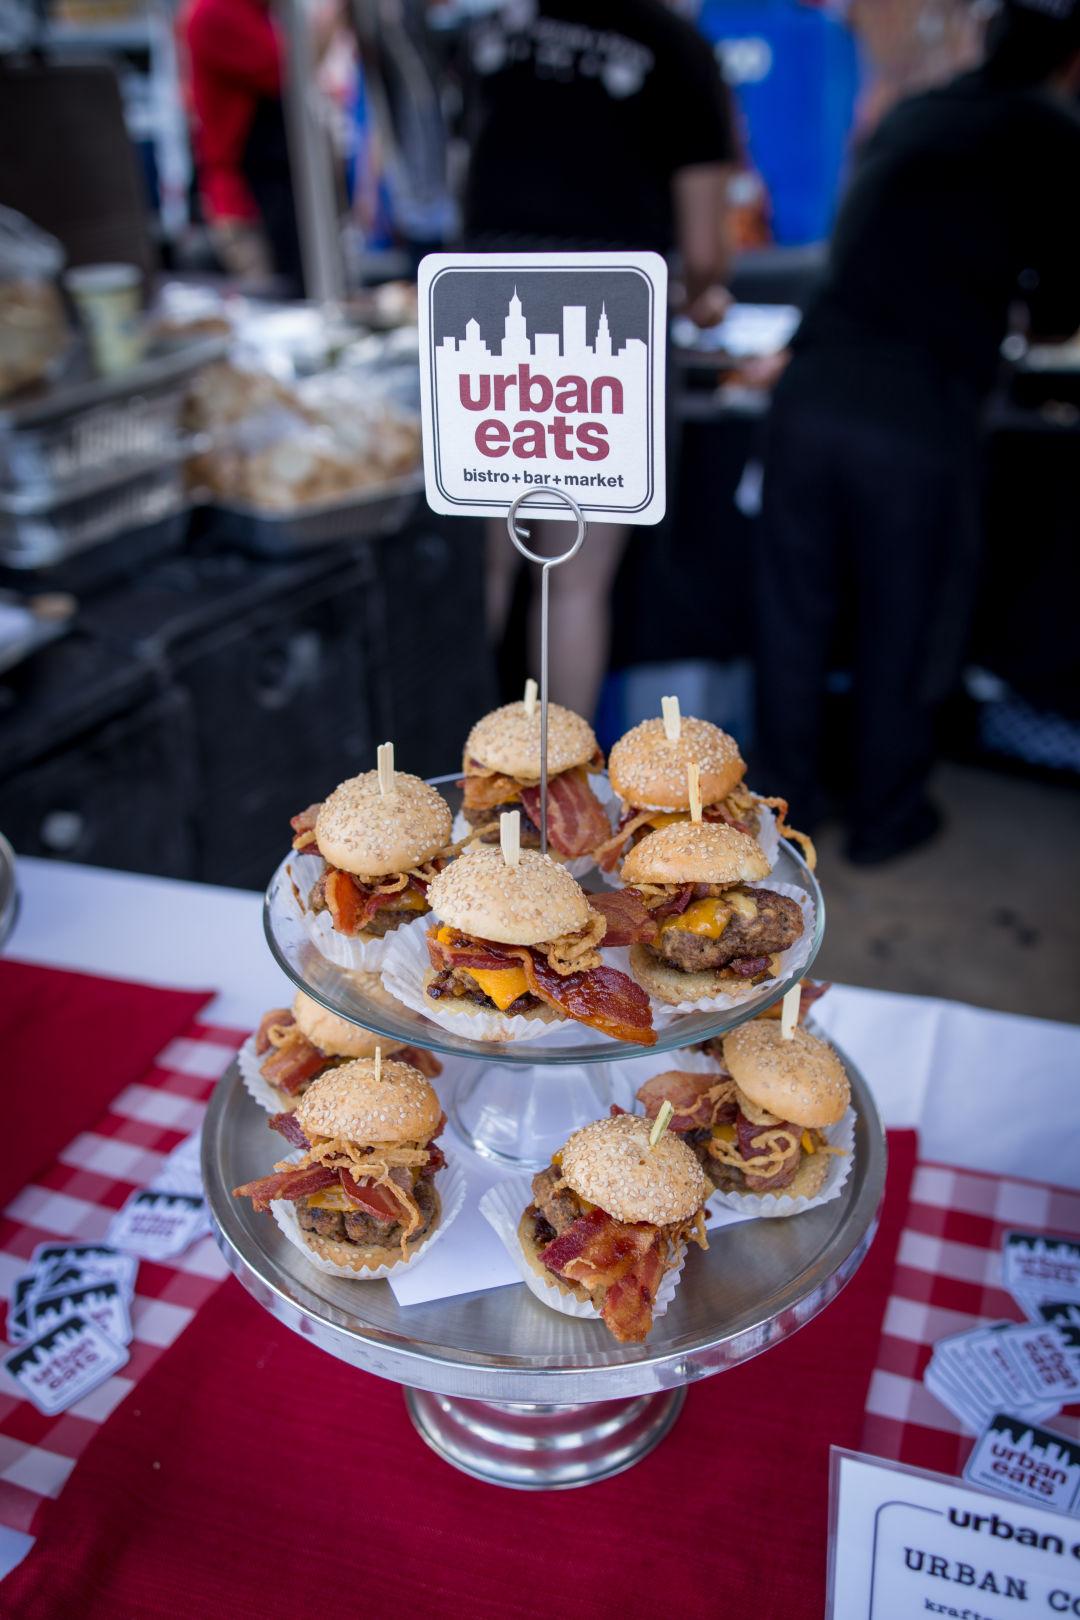 Urban eats burger display r9czvy